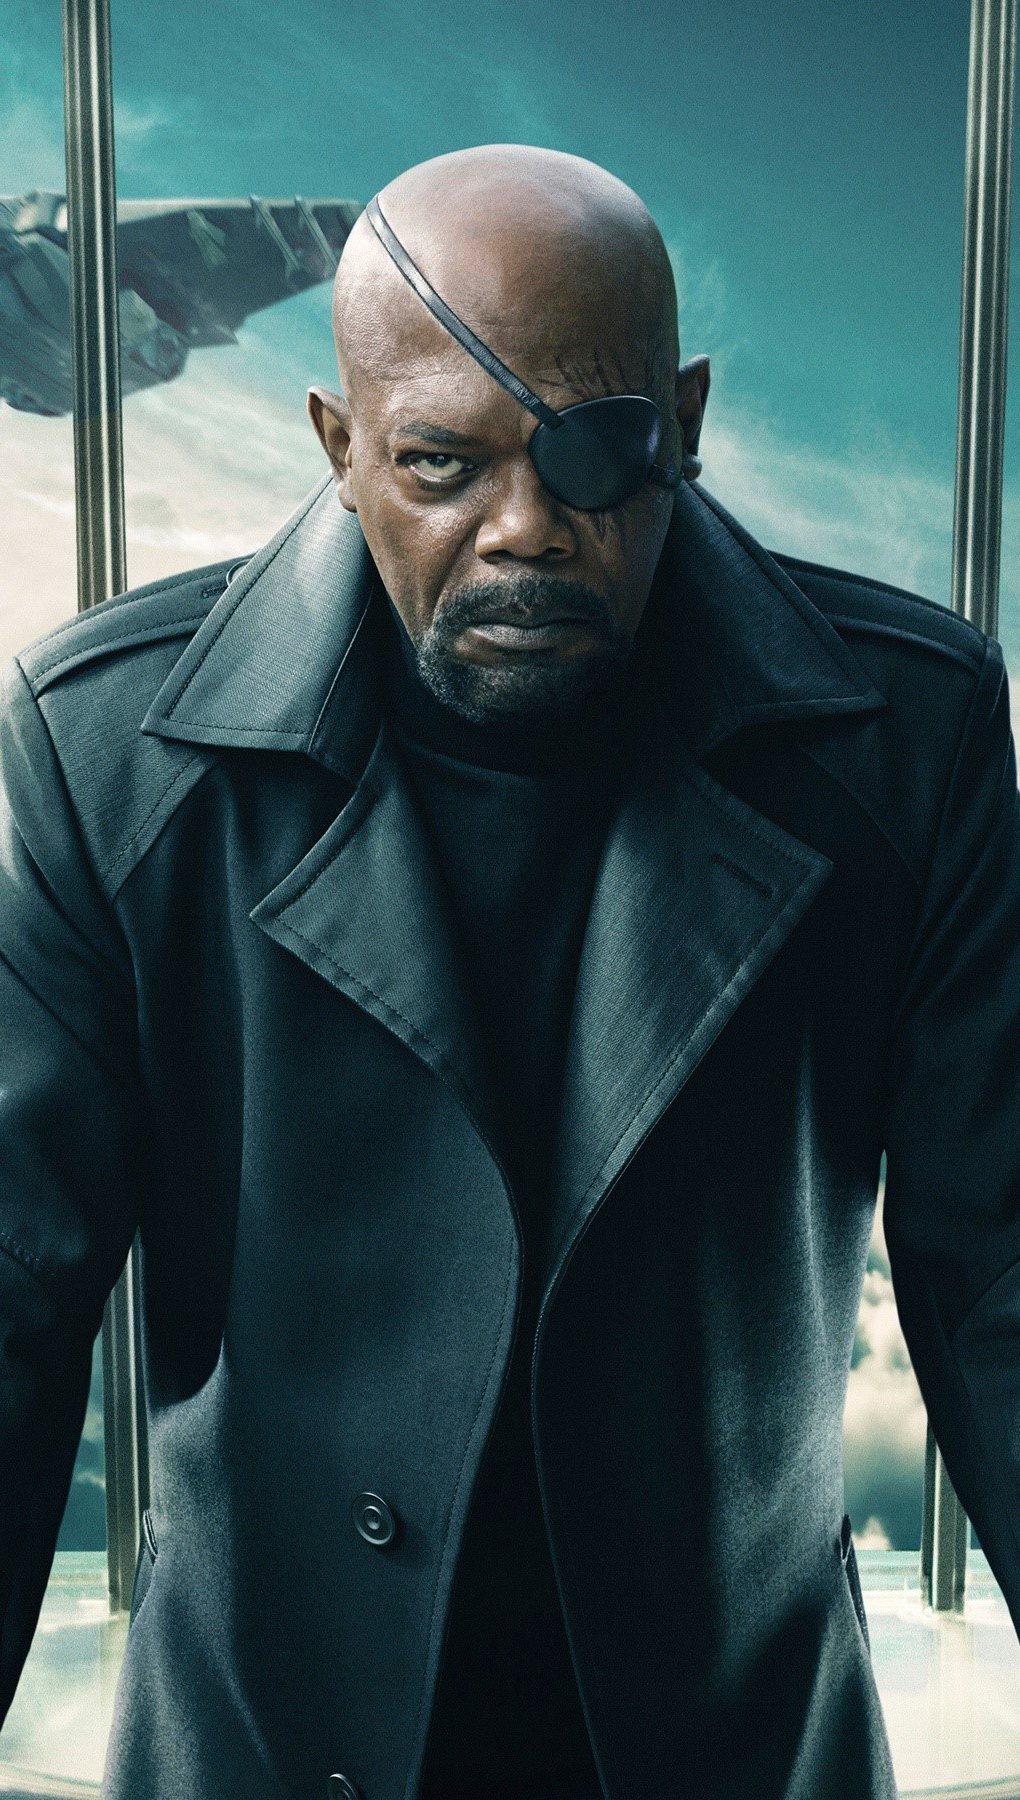 Fondos de pantalla Nick Fury en Capitan America Vertical